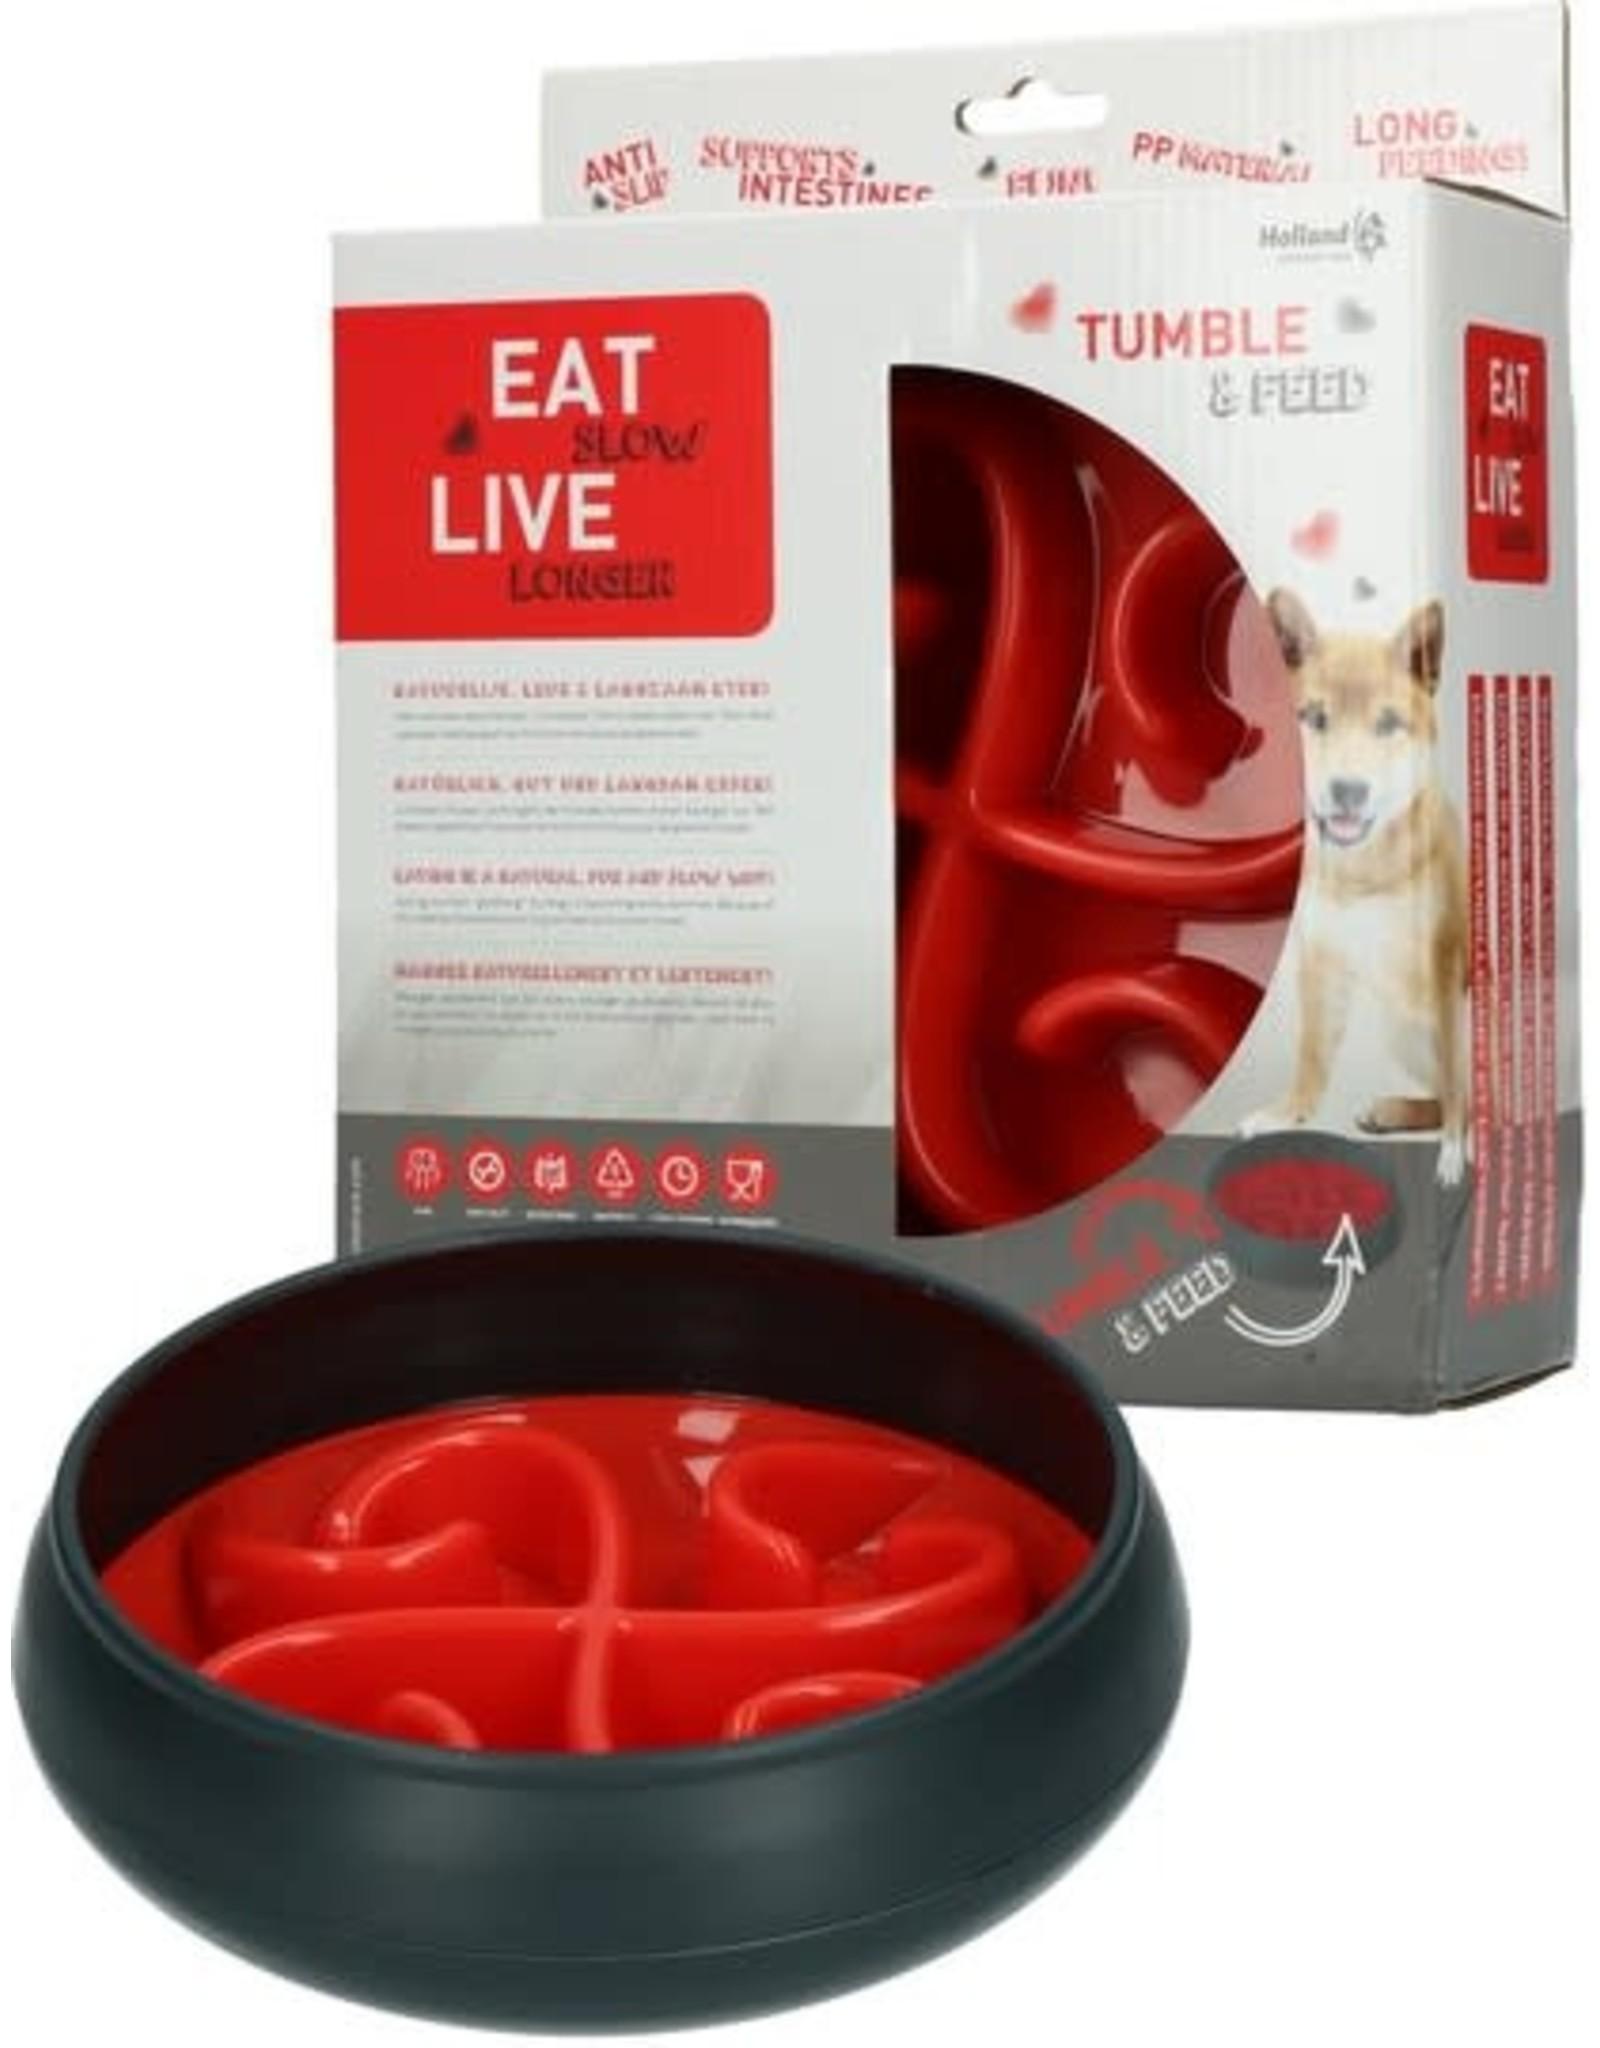 Tumble & Feed Rood